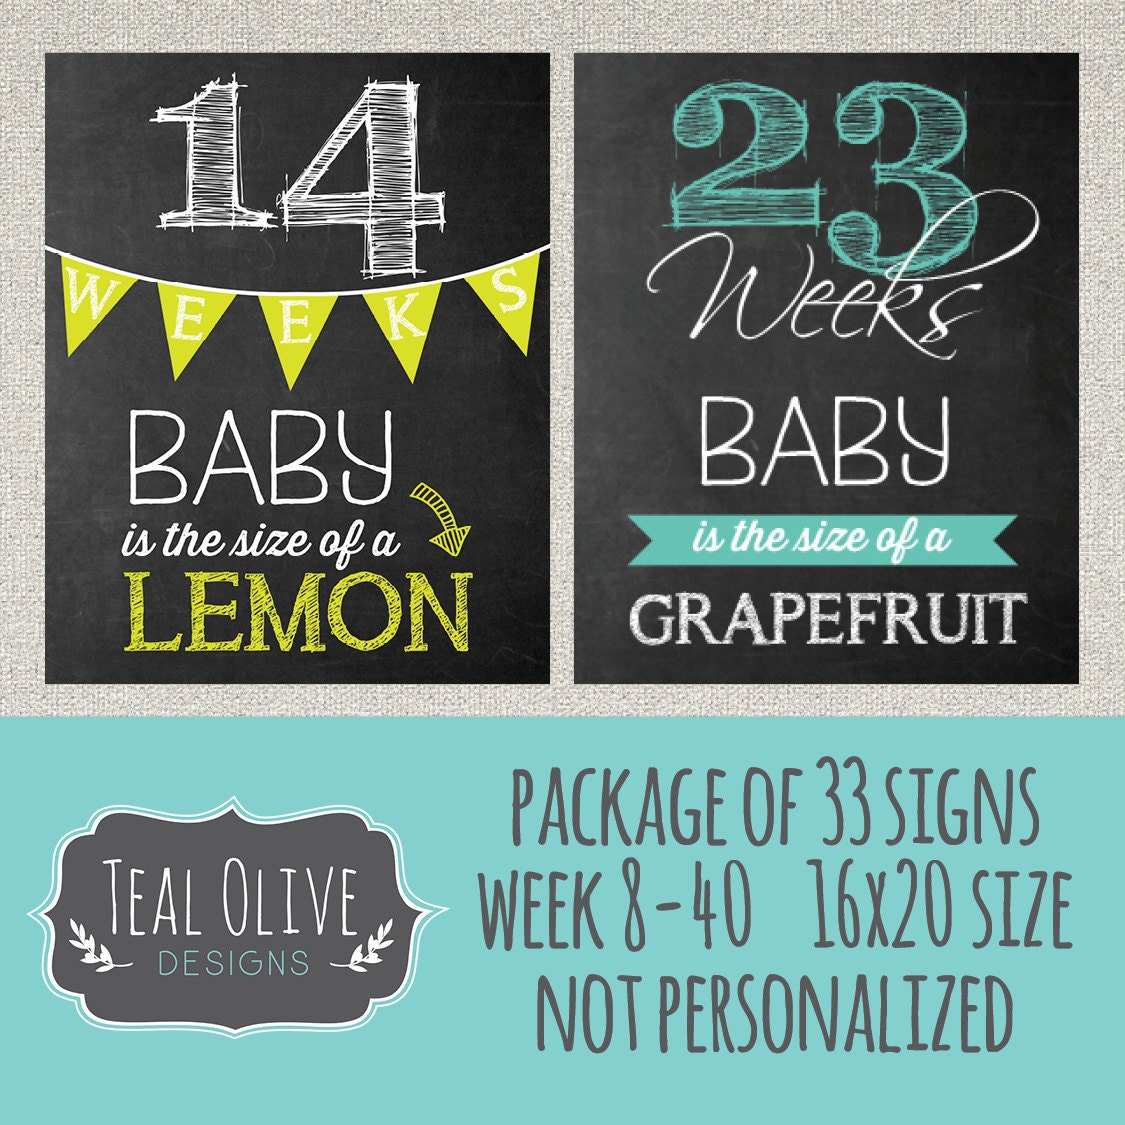 Semana embarazo pizarra cartel semana 8-40 paquete oferta 33